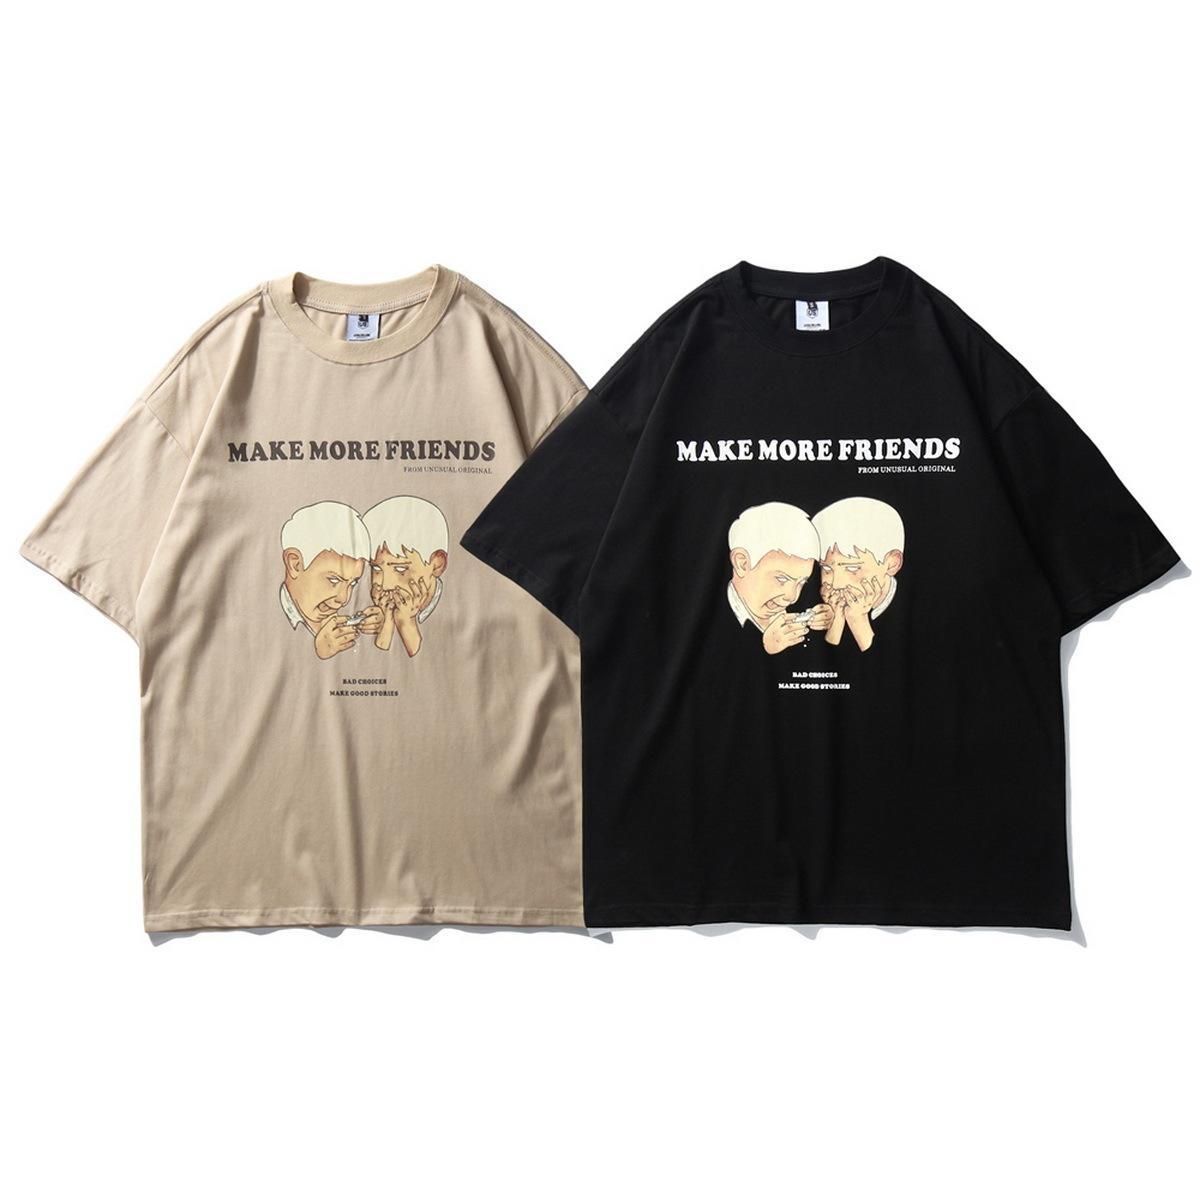 0520 designer t-shirts for women and men unisex Hip-hop style short sleeve street style couples t-shirt charming fashion novelty fashionable